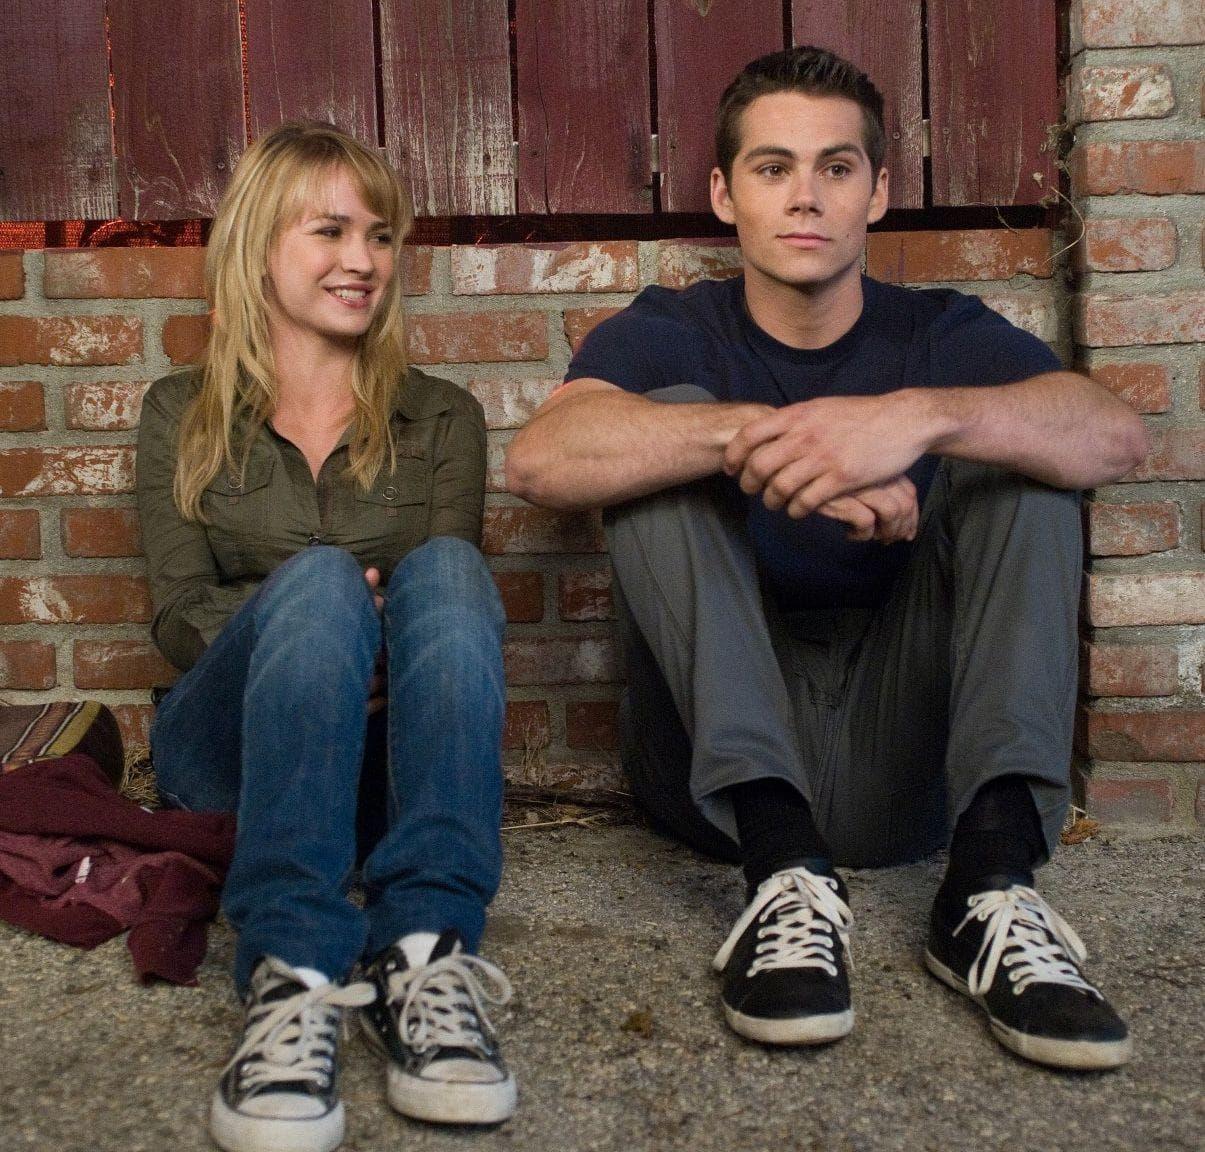 Conn connstellation trompet dating 21 sosiale Belfast hastighet dating